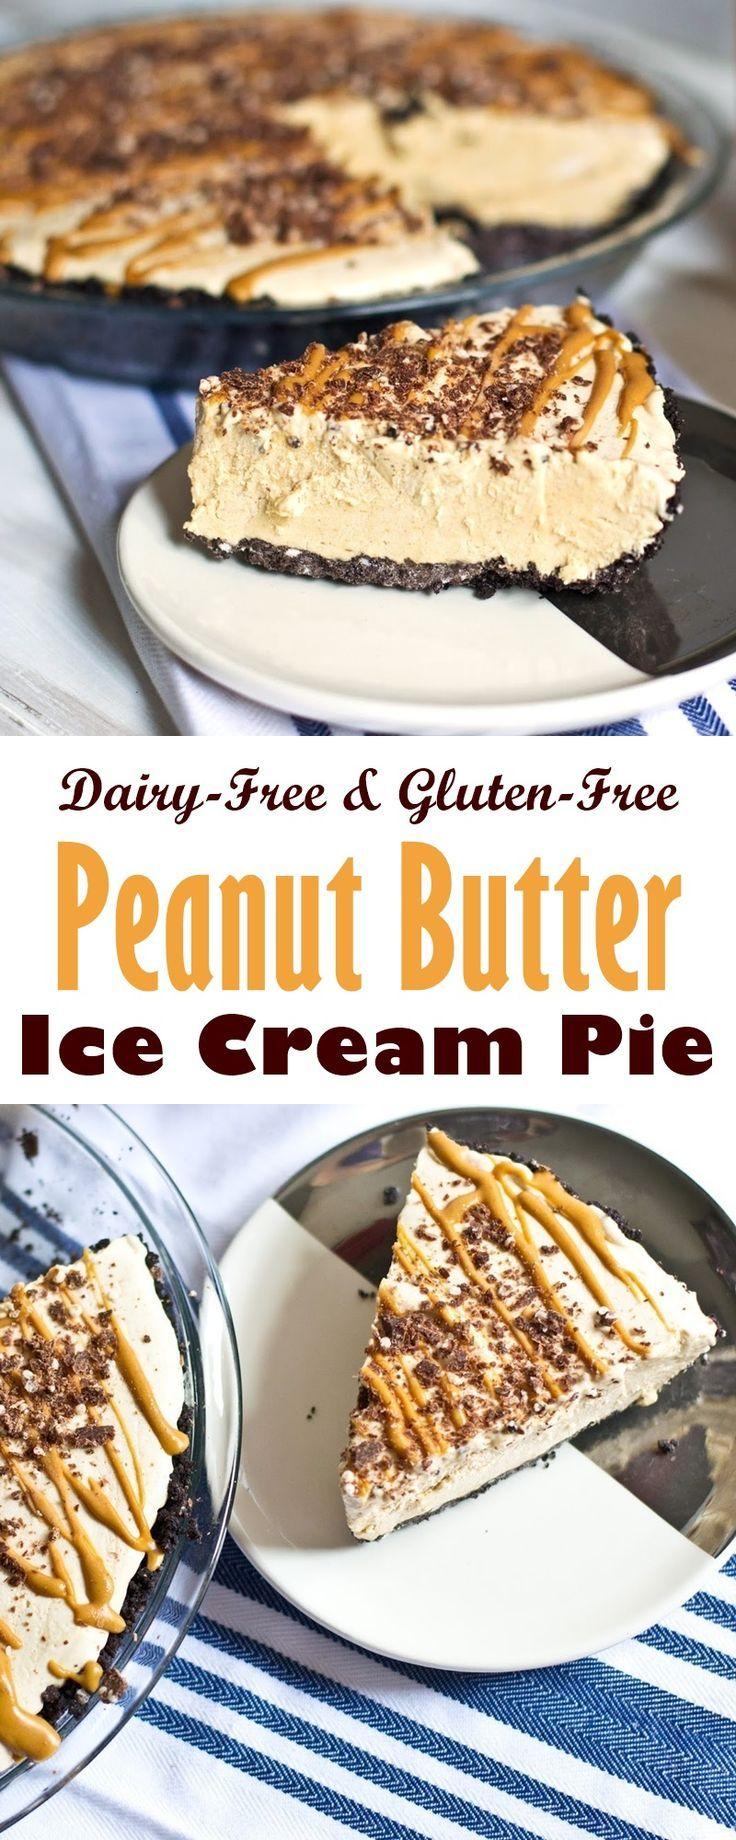 DairyFree Peanut Butter Ice Cream Pie with Chocolate